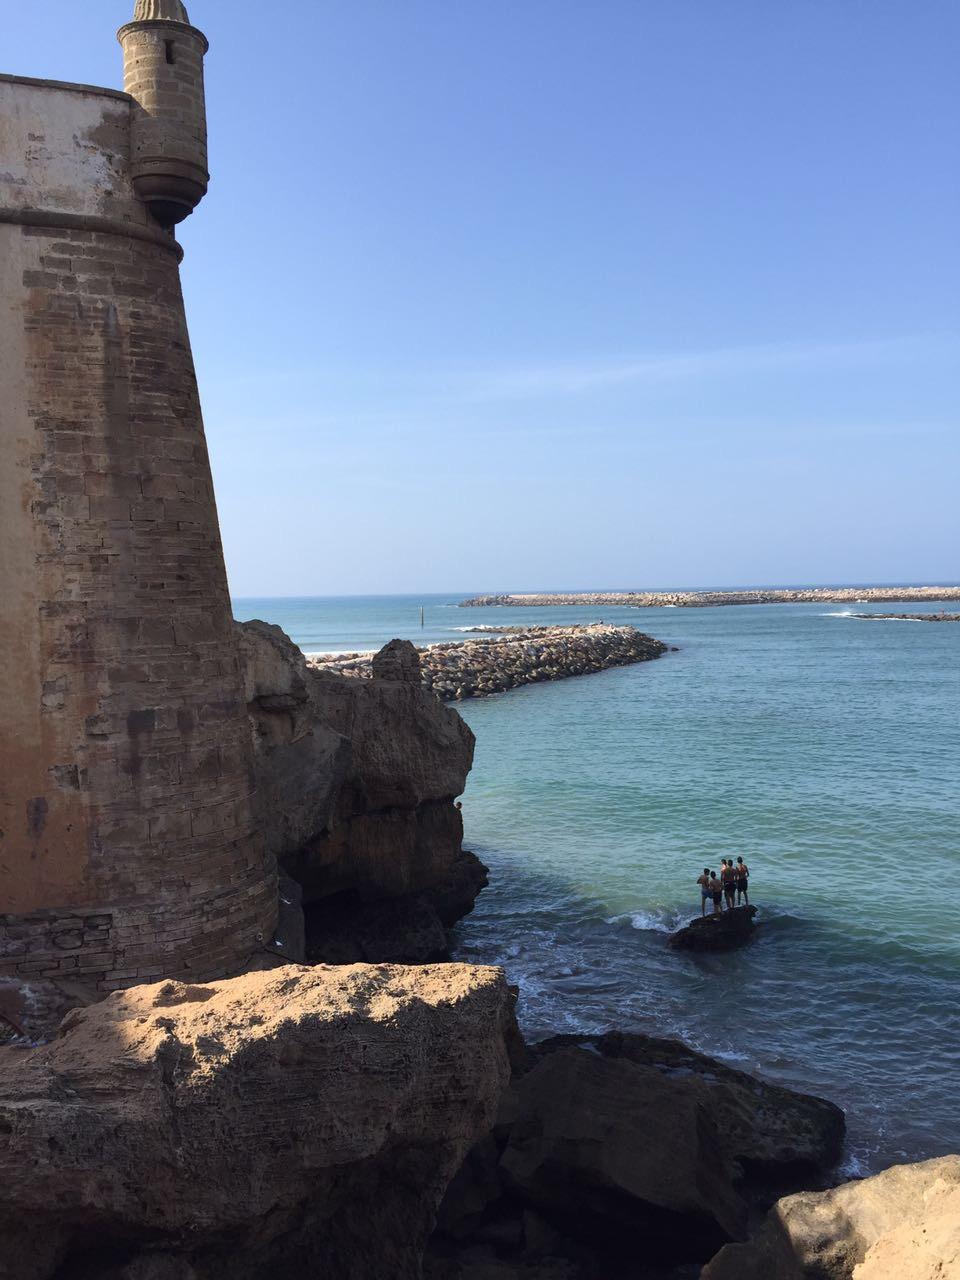 Rabat's beach